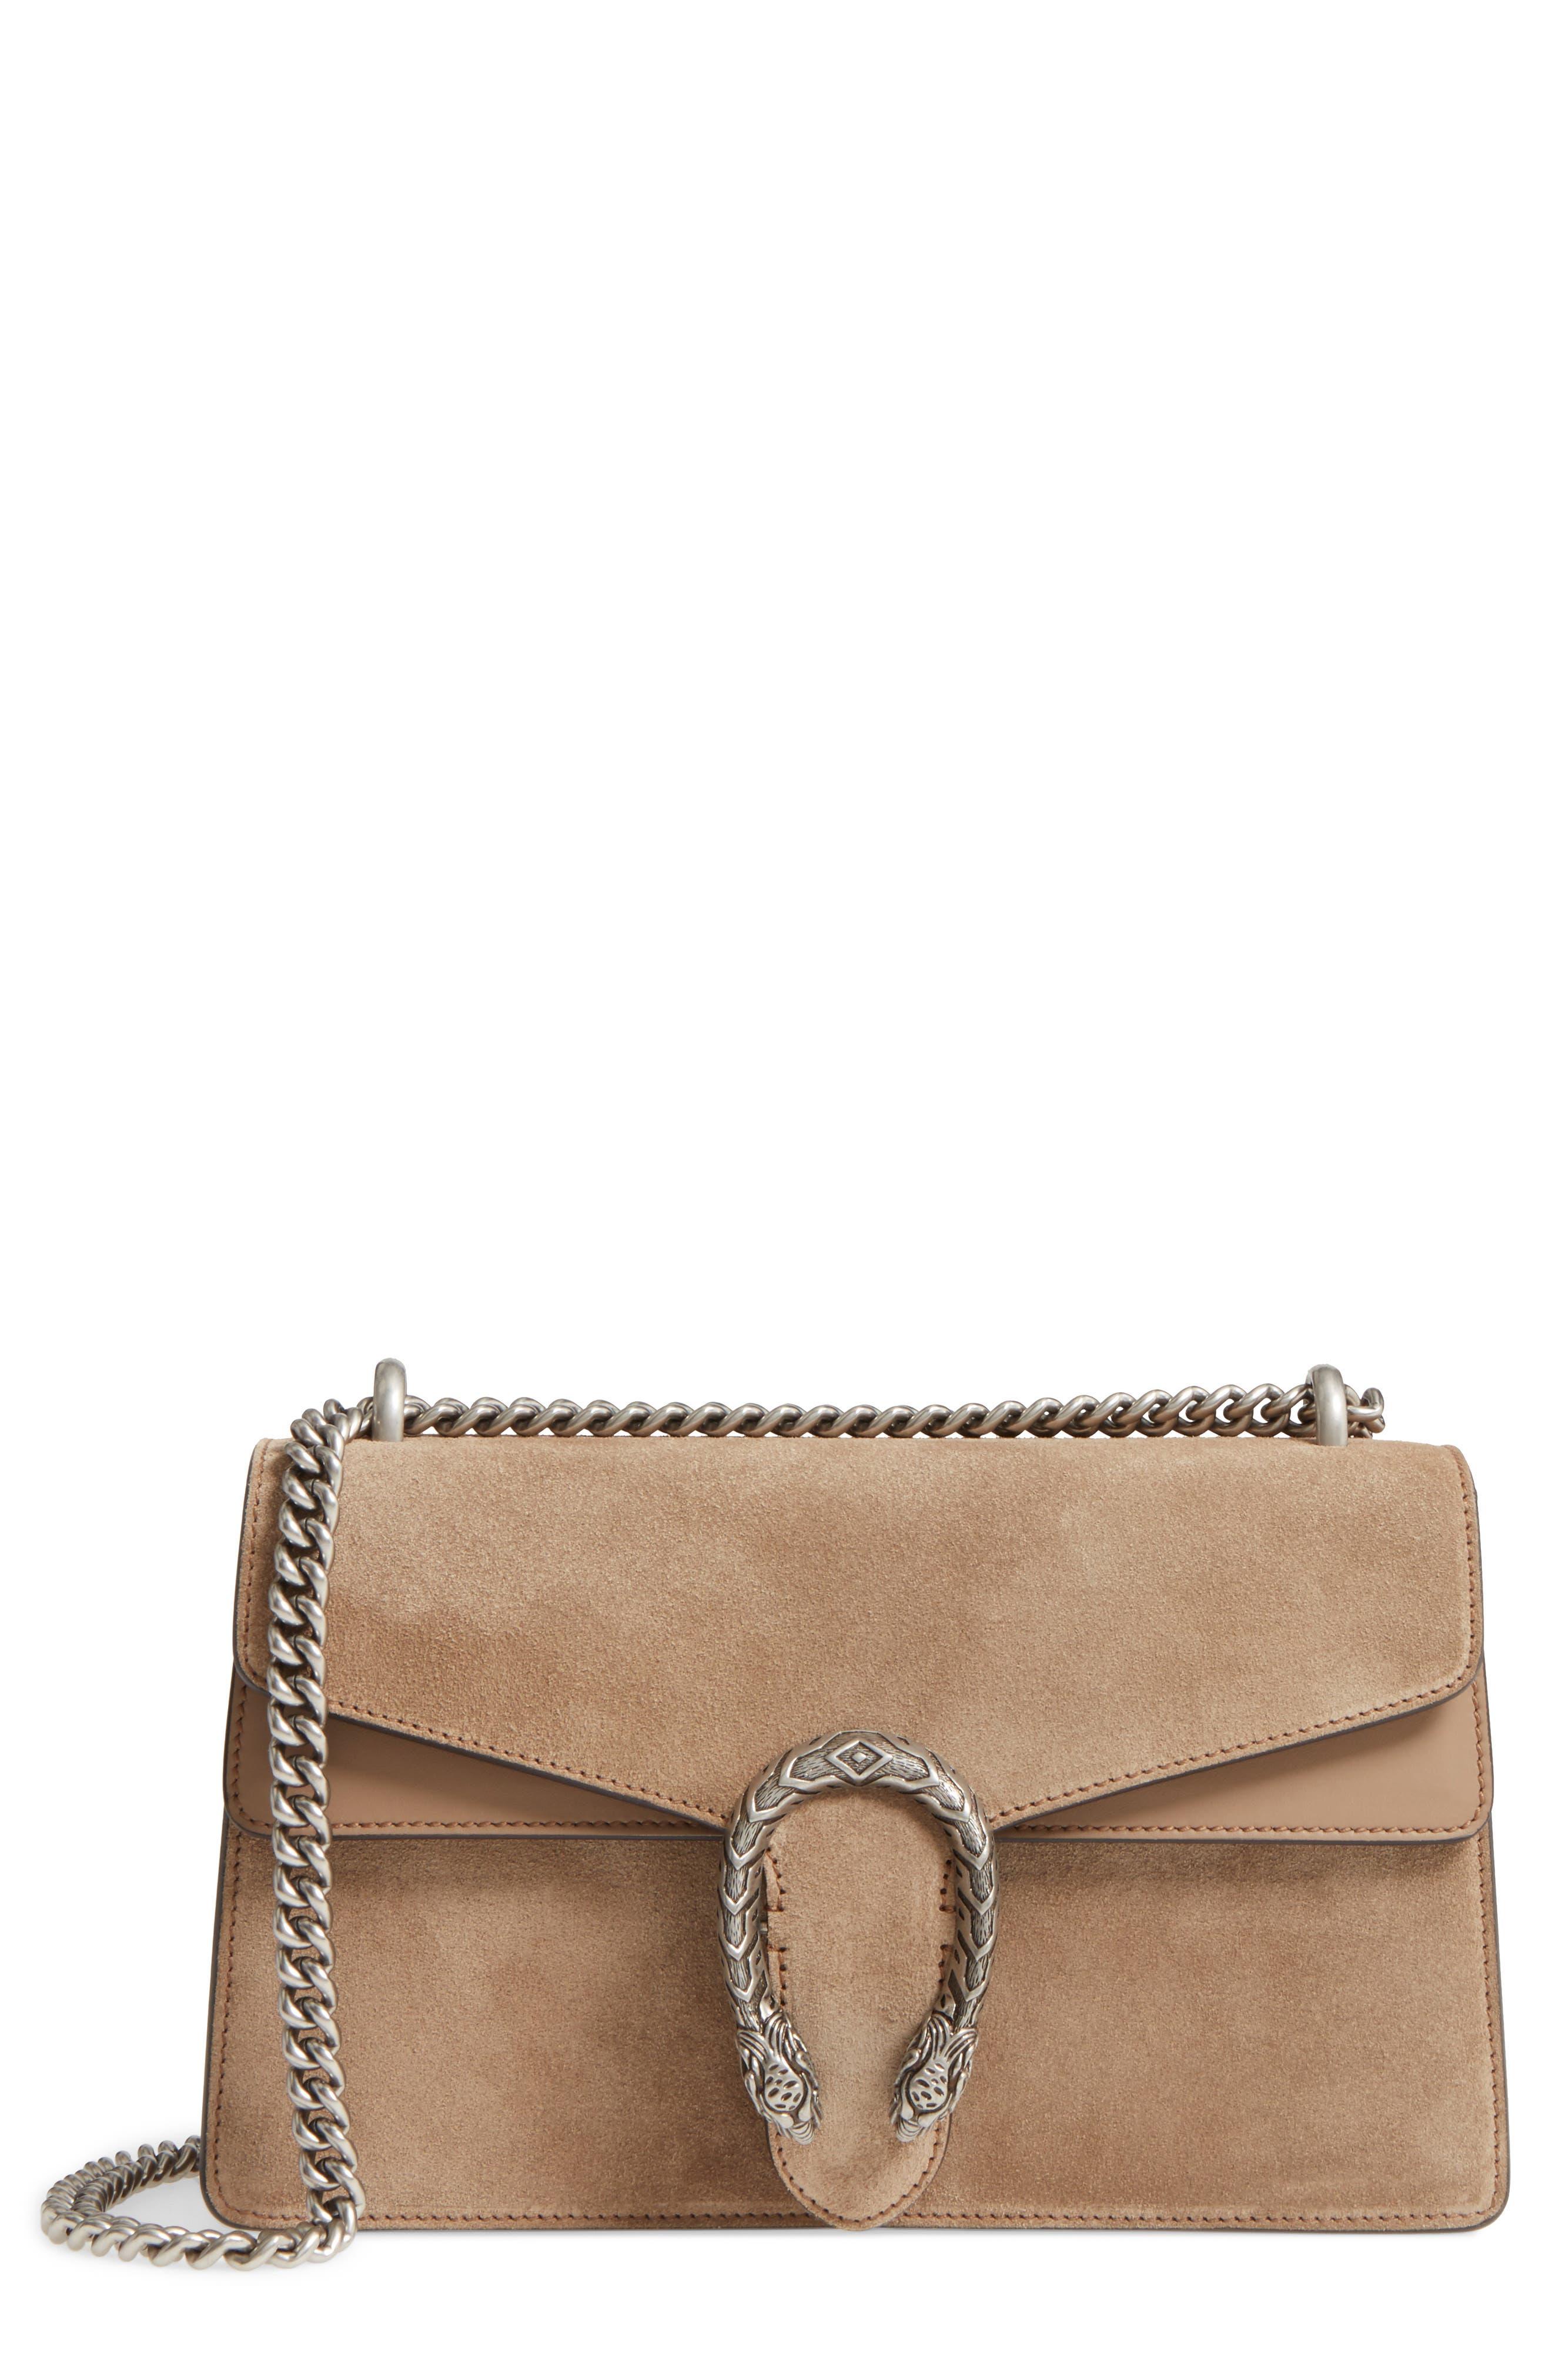 Main Image - Gucci Small Dionysus Suede Shoulder Bag